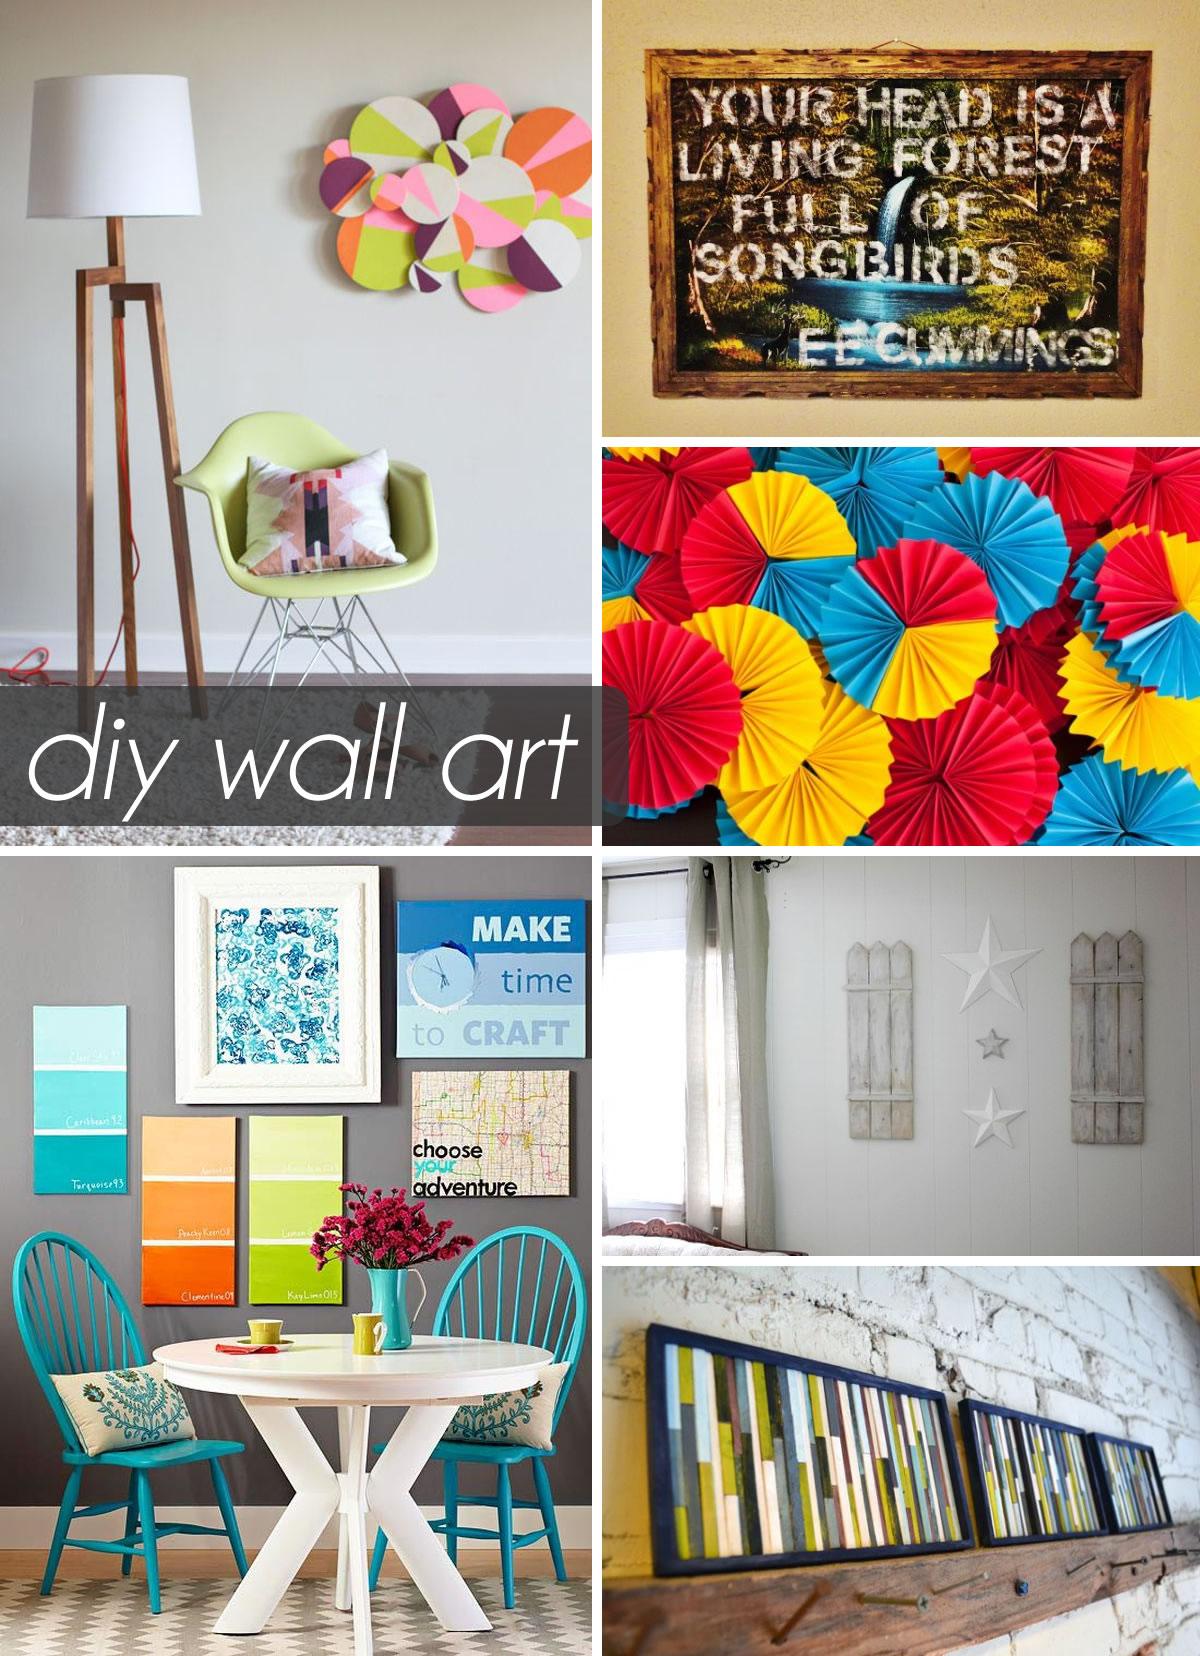 Marvellous Home Decor Cheap Ideas Your Home Craft Ideas Diy Wall Art Ideas  Home Decor